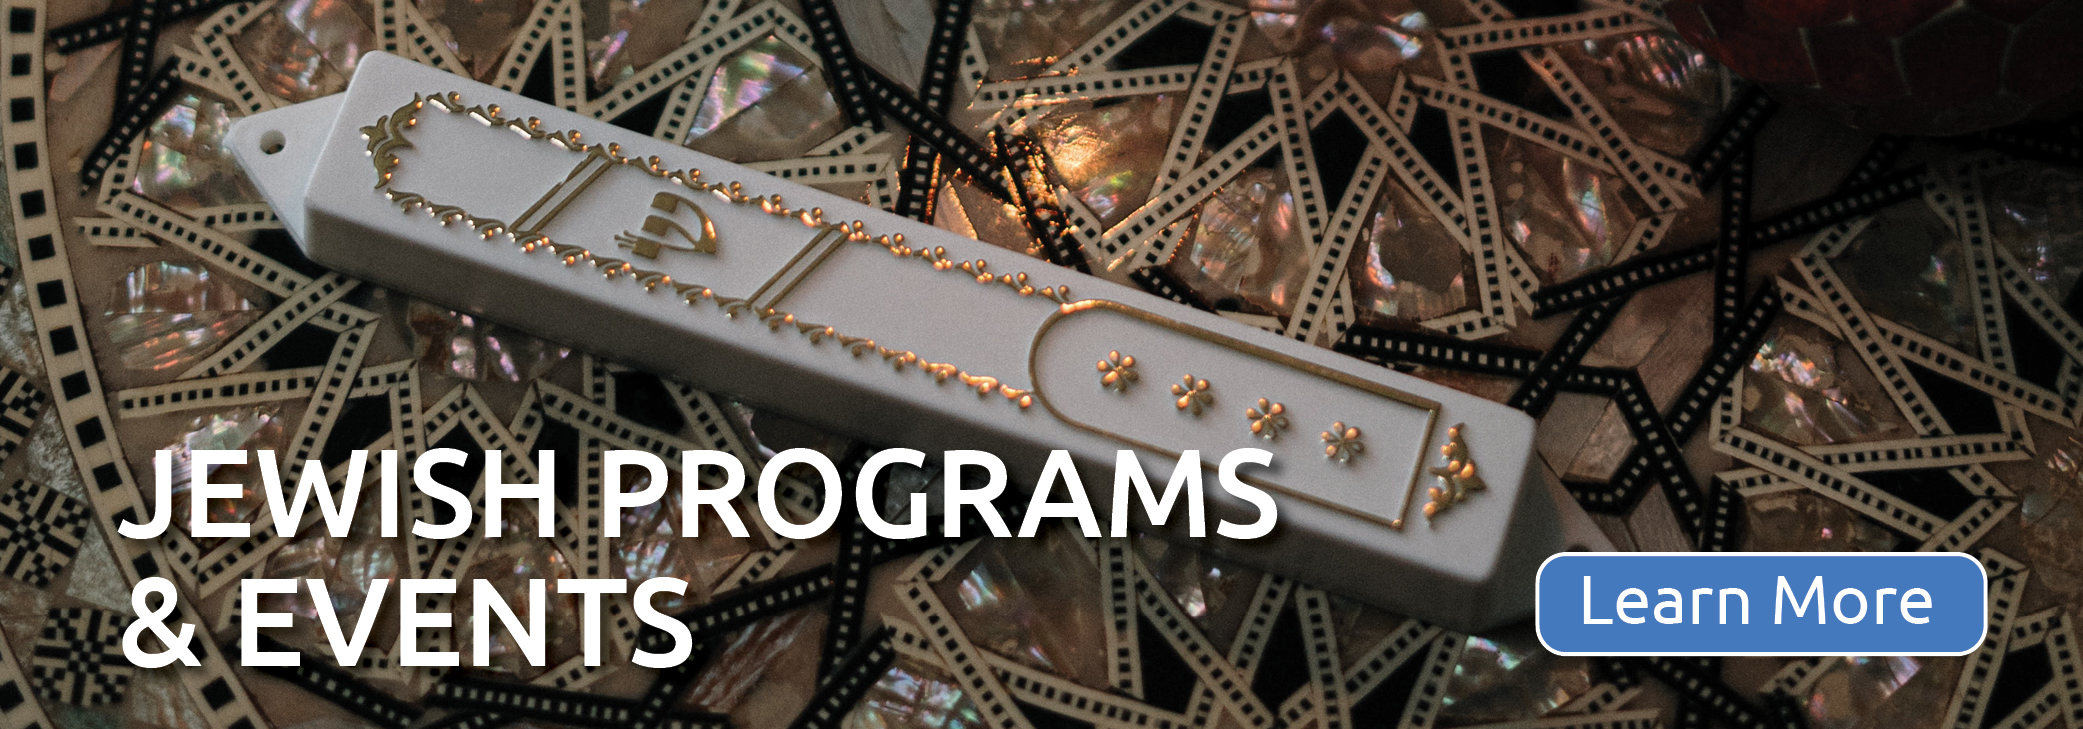 Jewihs programs & events_WEBHeader2